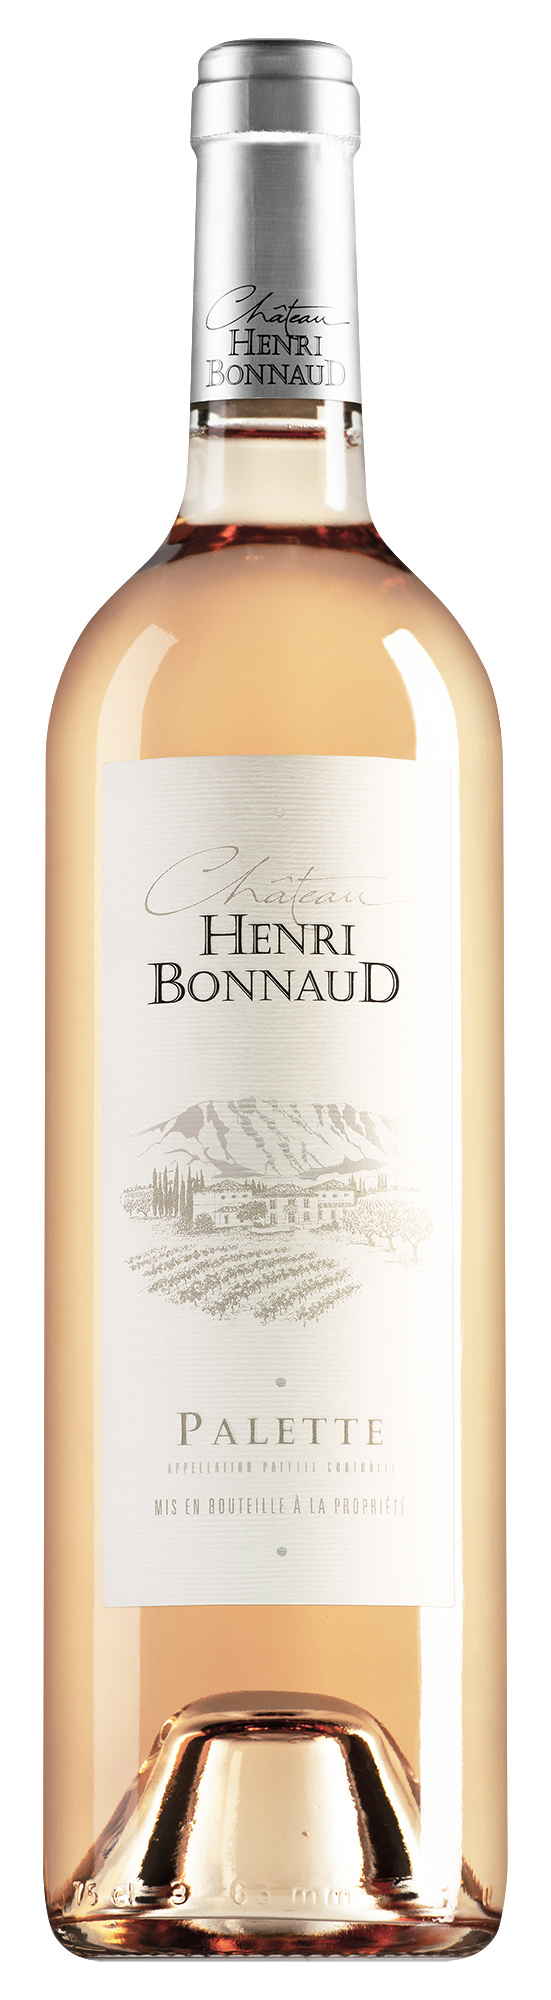 Schloss Henri Bonnaud Palette Rosé 2020